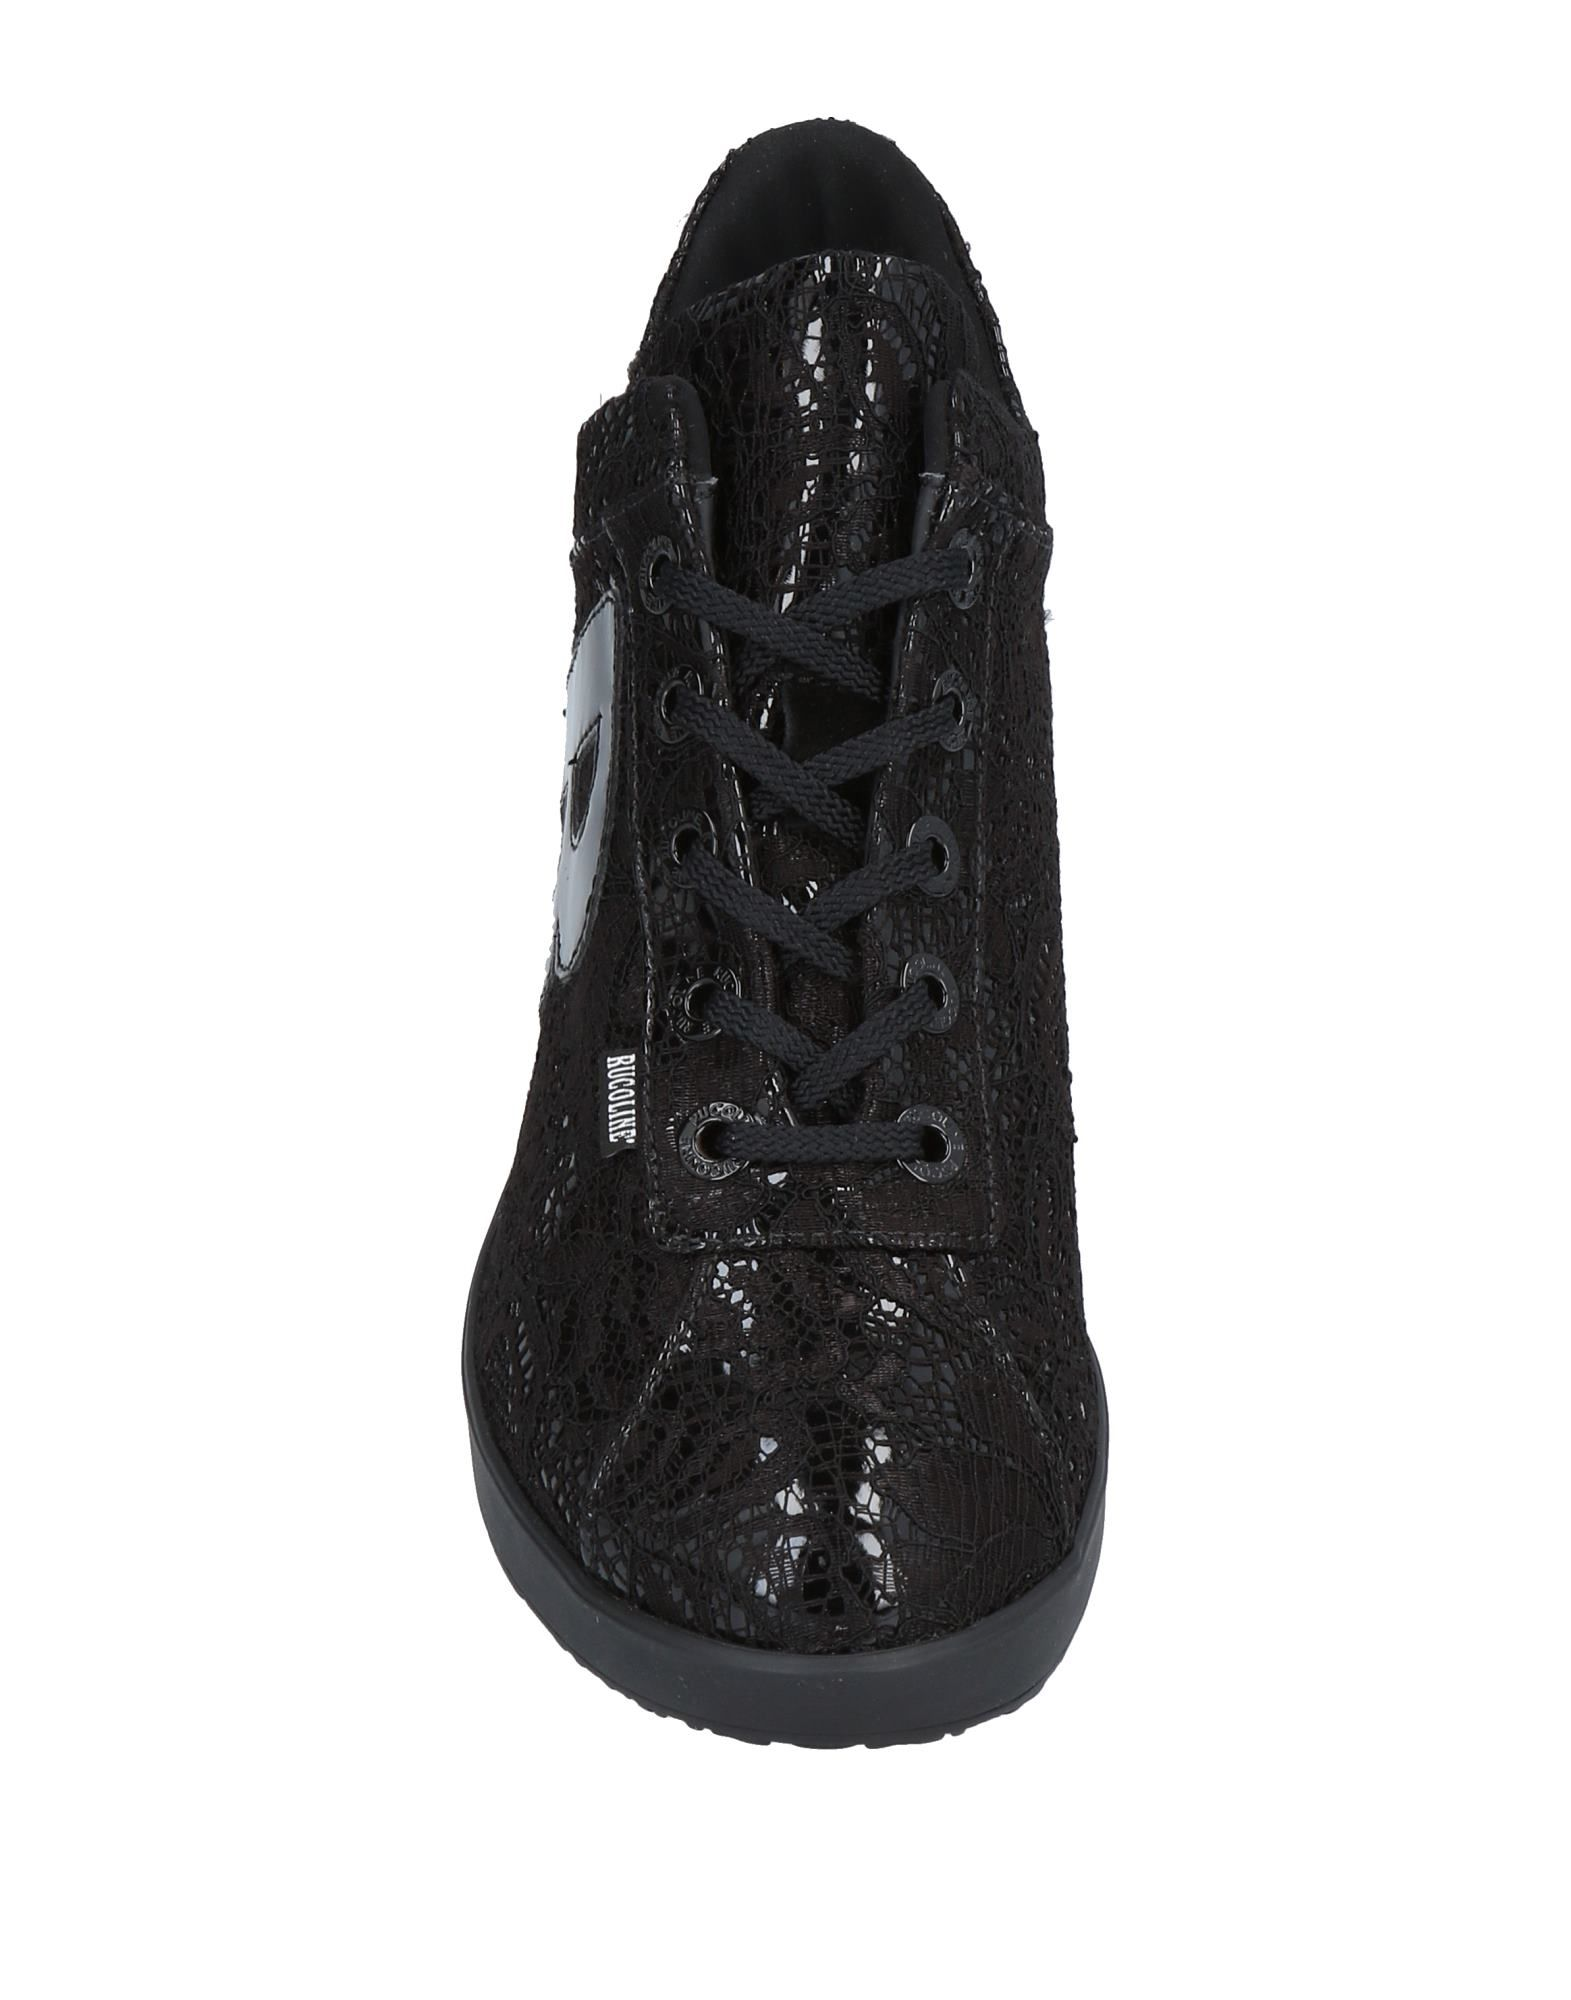 Ruco Line Sneakers Damen  11478622TV Gute Qualität beliebte beliebte beliebte Schuhe 7f02ef